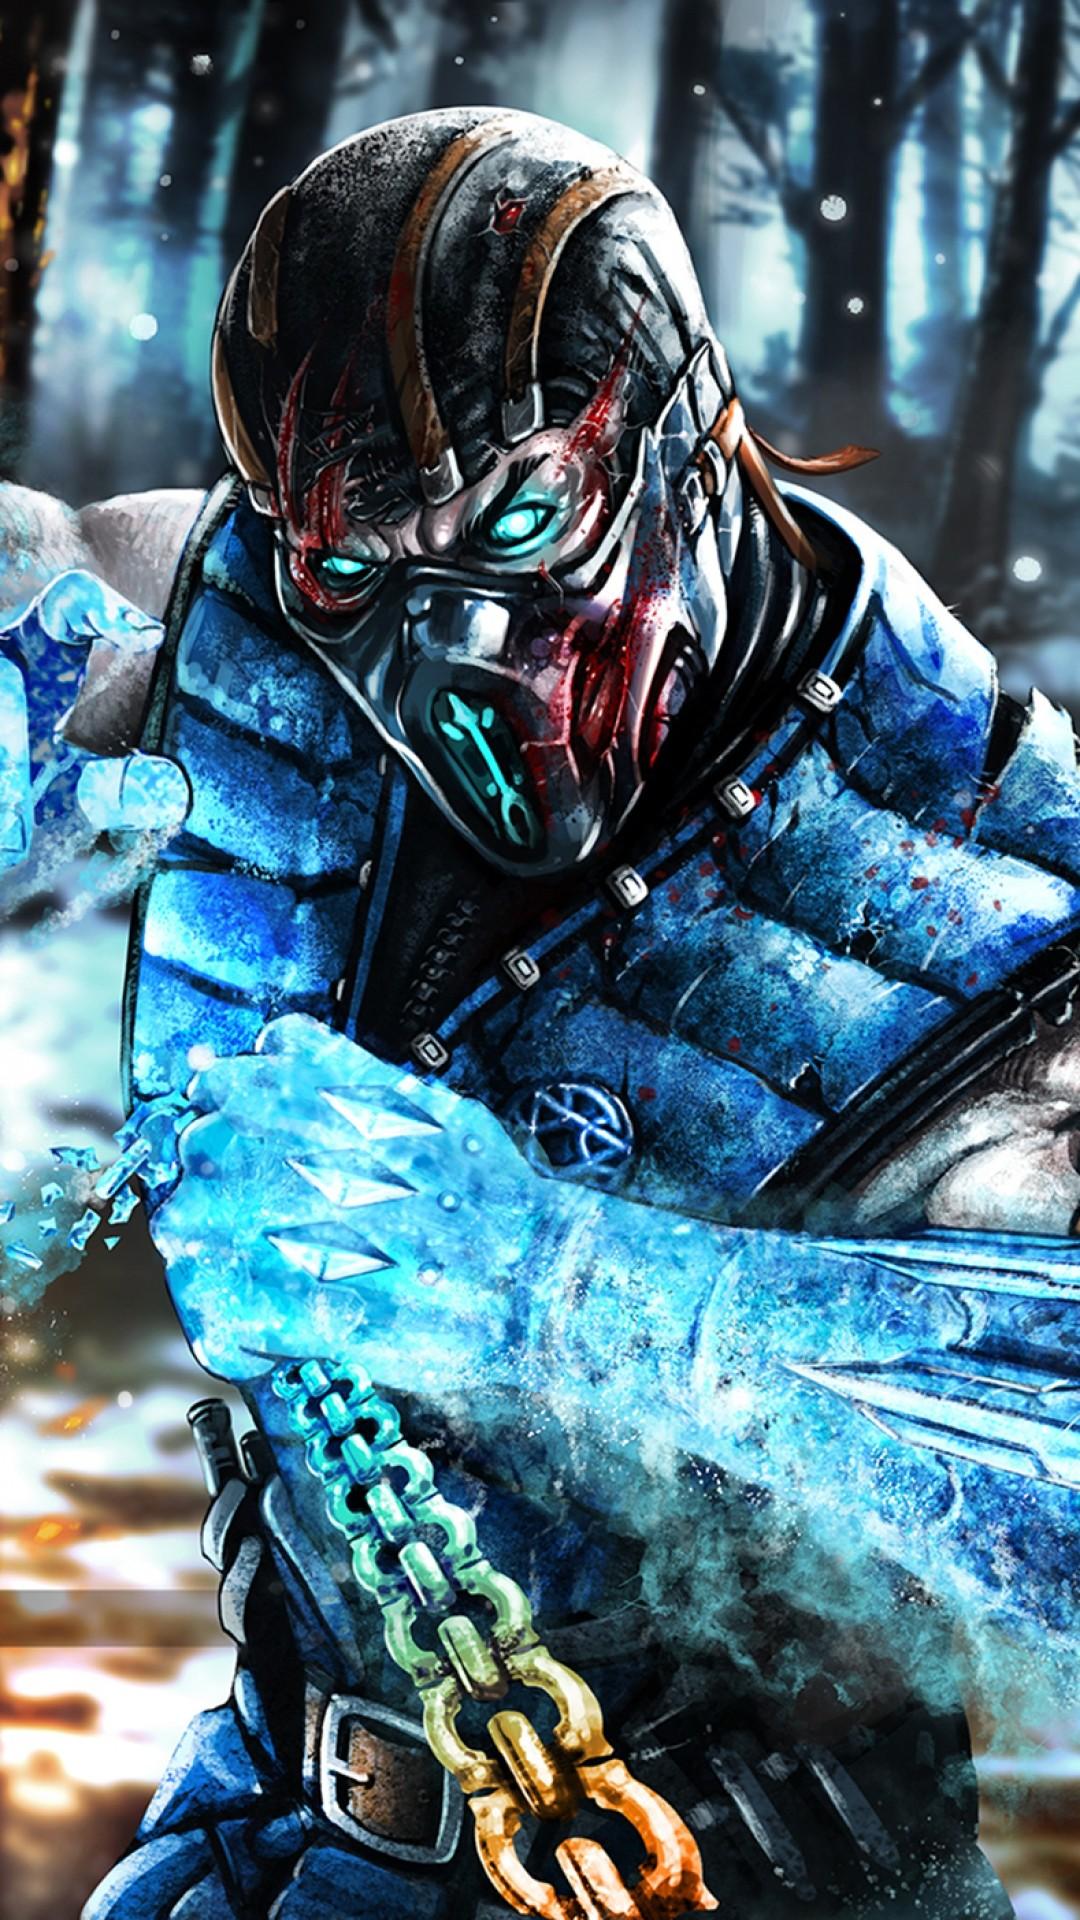 Explore Mortal Kombat X, Sub Zero Mortal Kombat, and more! Mortal Kombat  Wallpapers for Iphone …